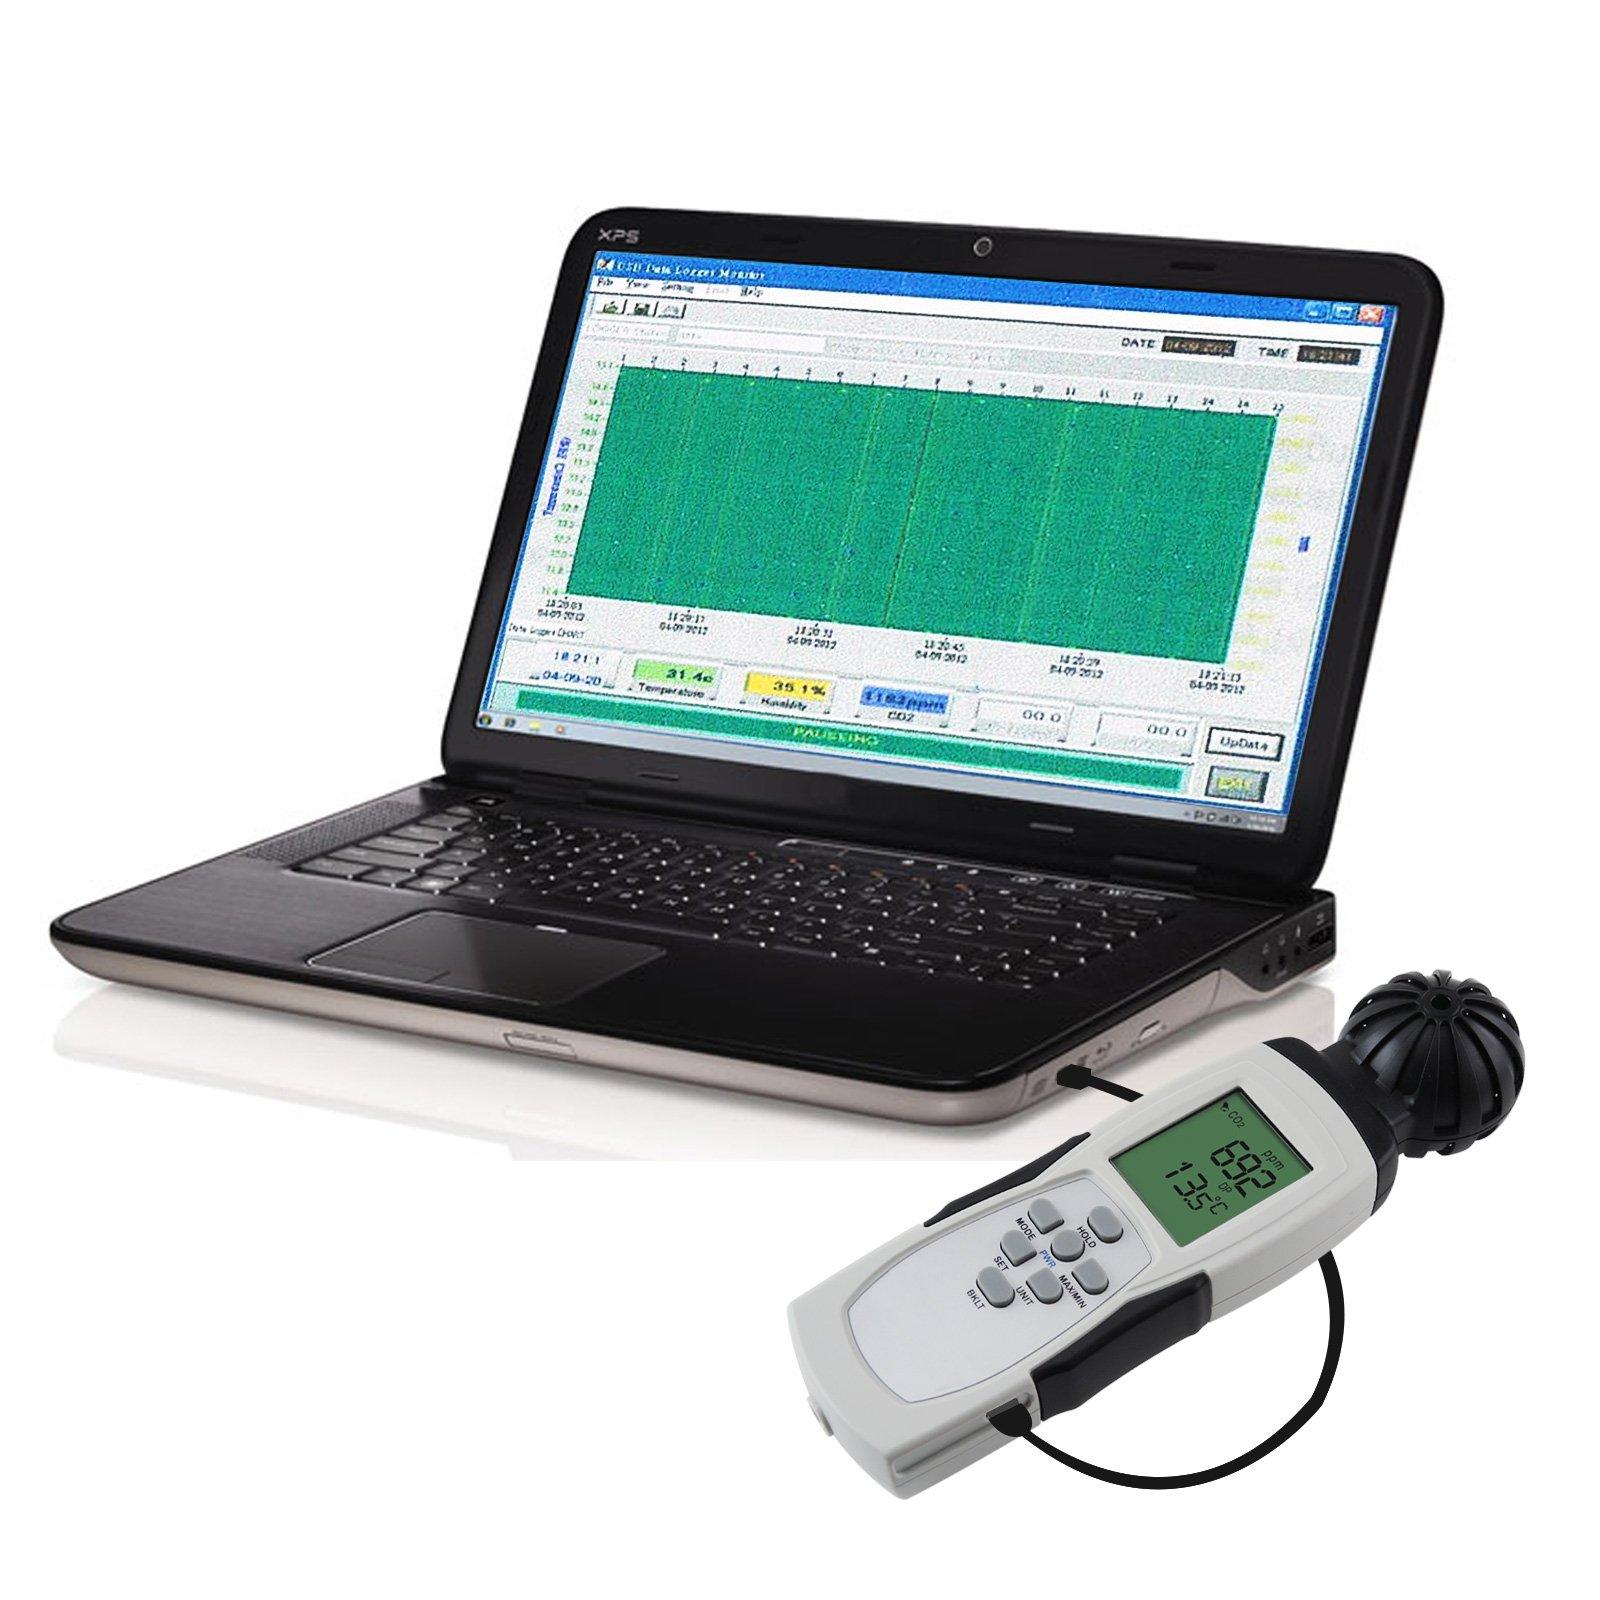 Carbon Dioxide Sensor Meter Tester 9999ppm CO2 Temperature RH Measurement by Gain Express (Image #5)